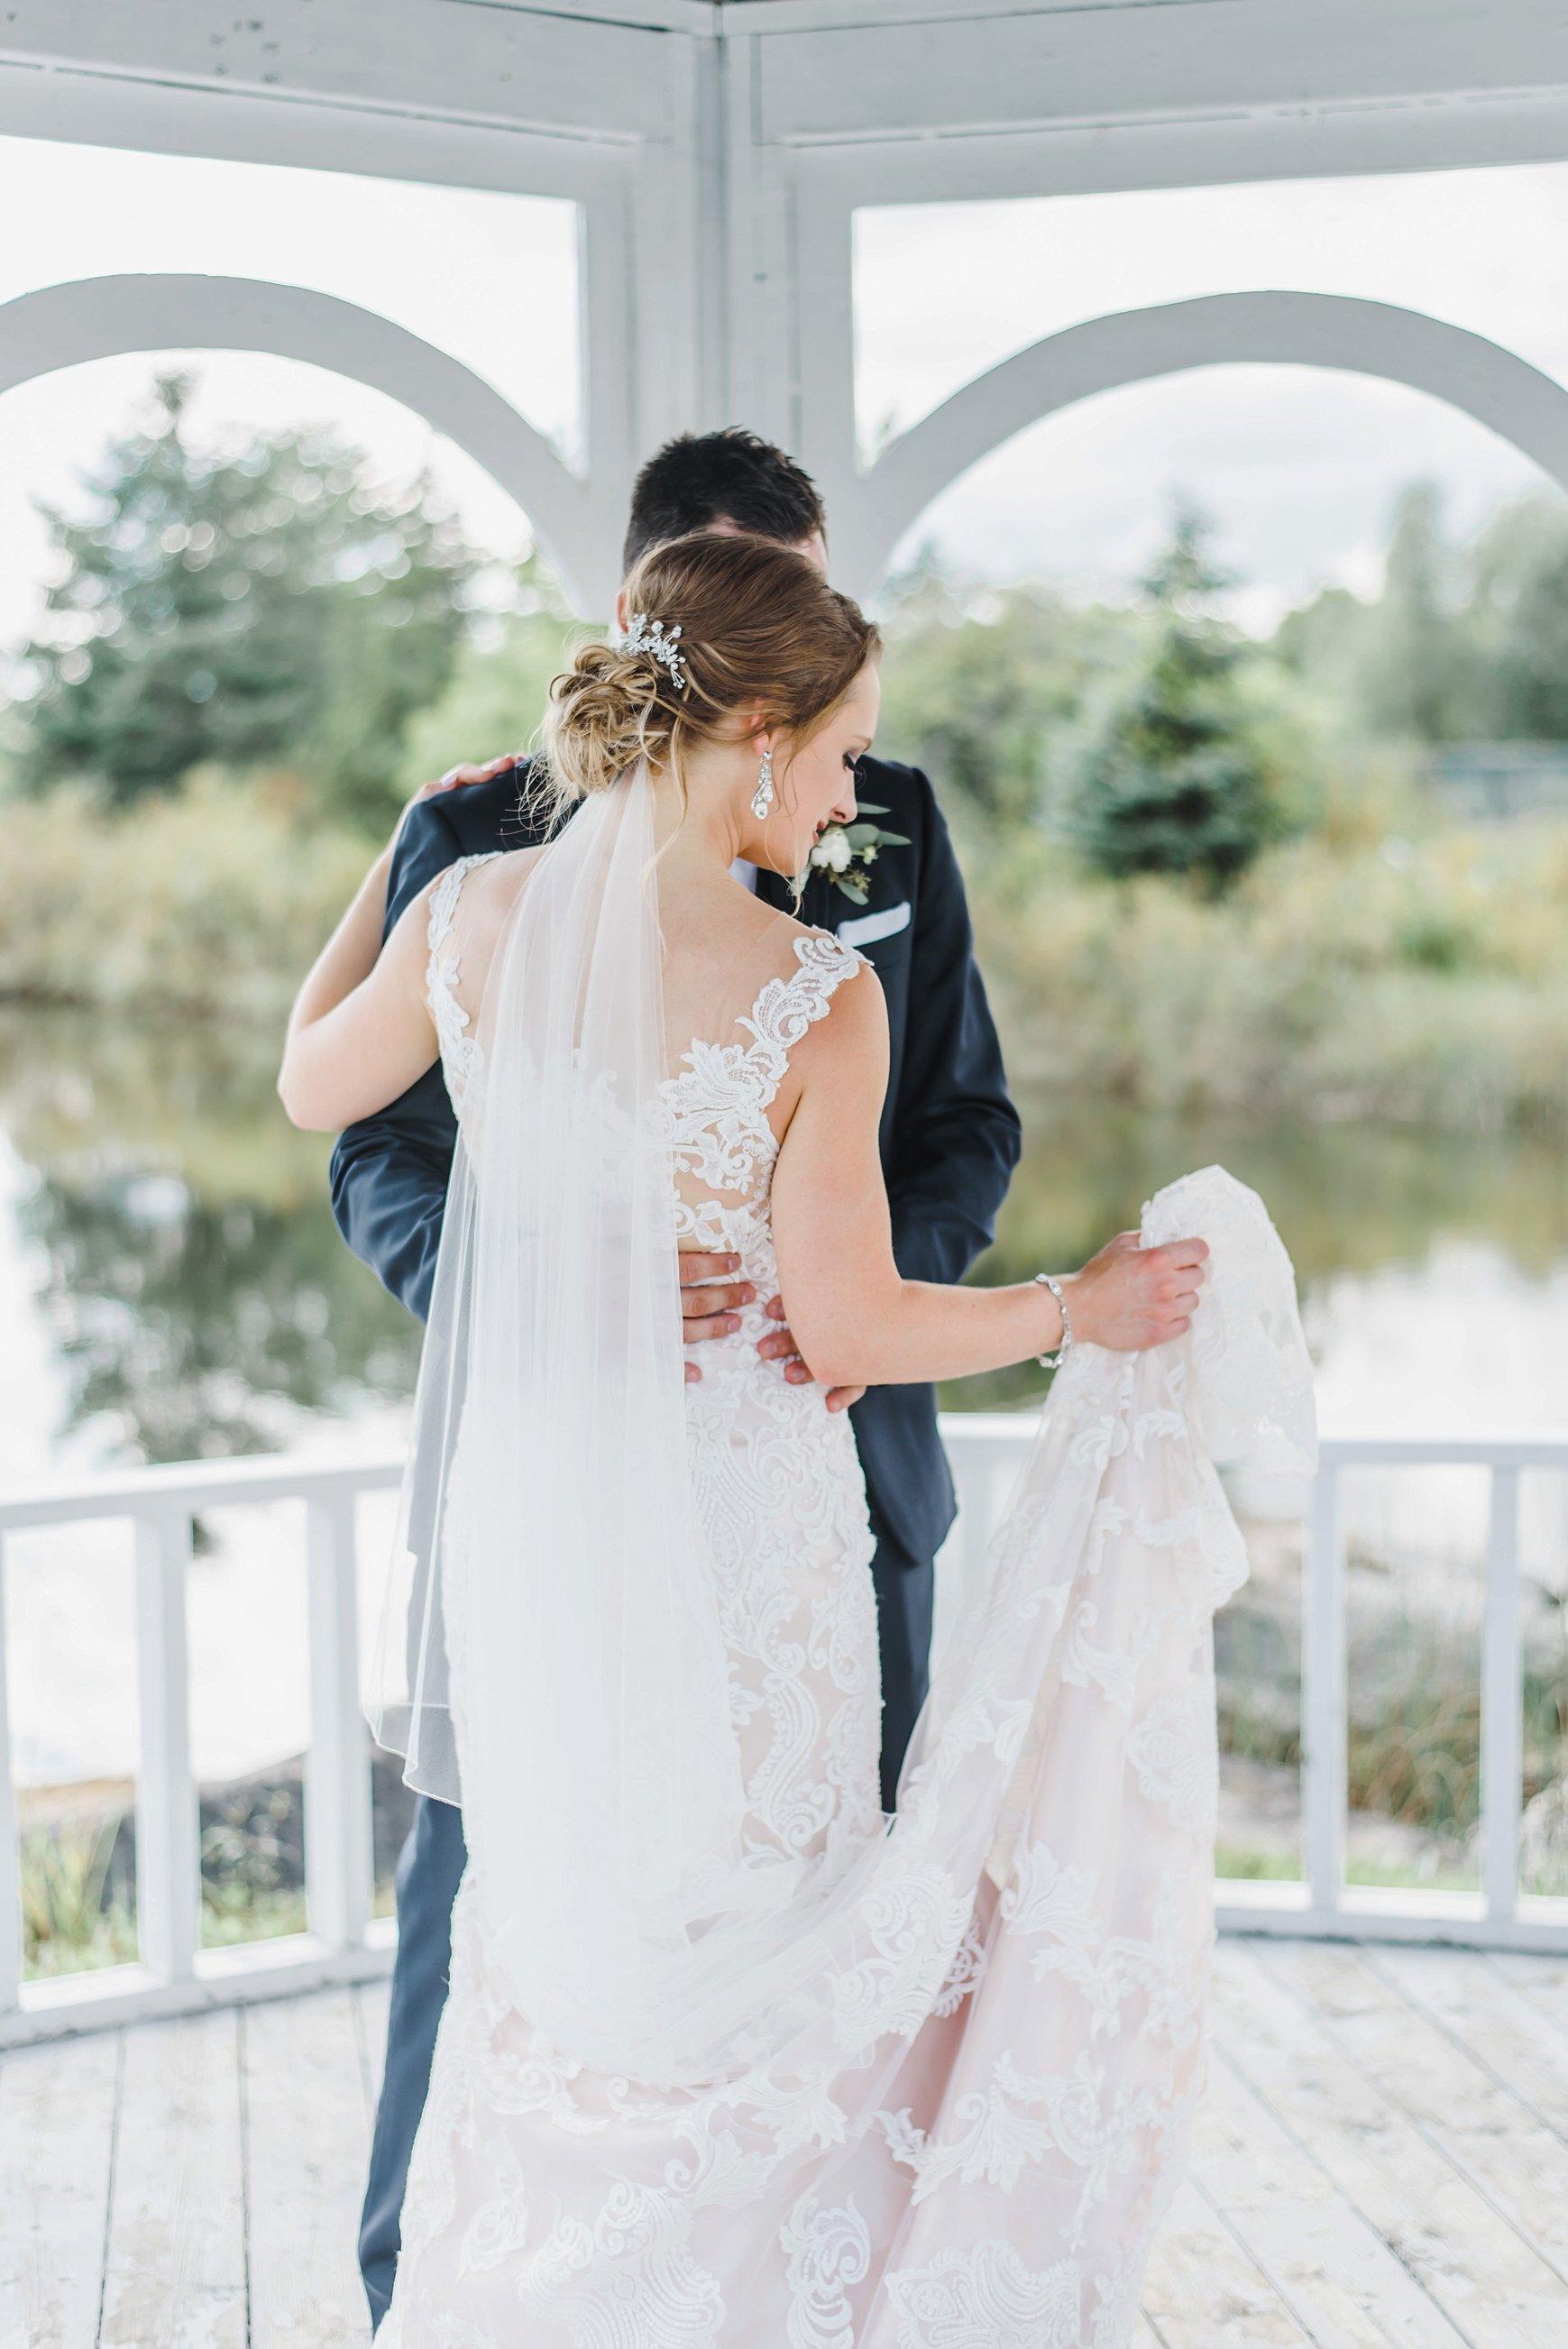 light airy indie fine art ottawa wedding photographer | Ali and Batoul Photography_1296.jpg